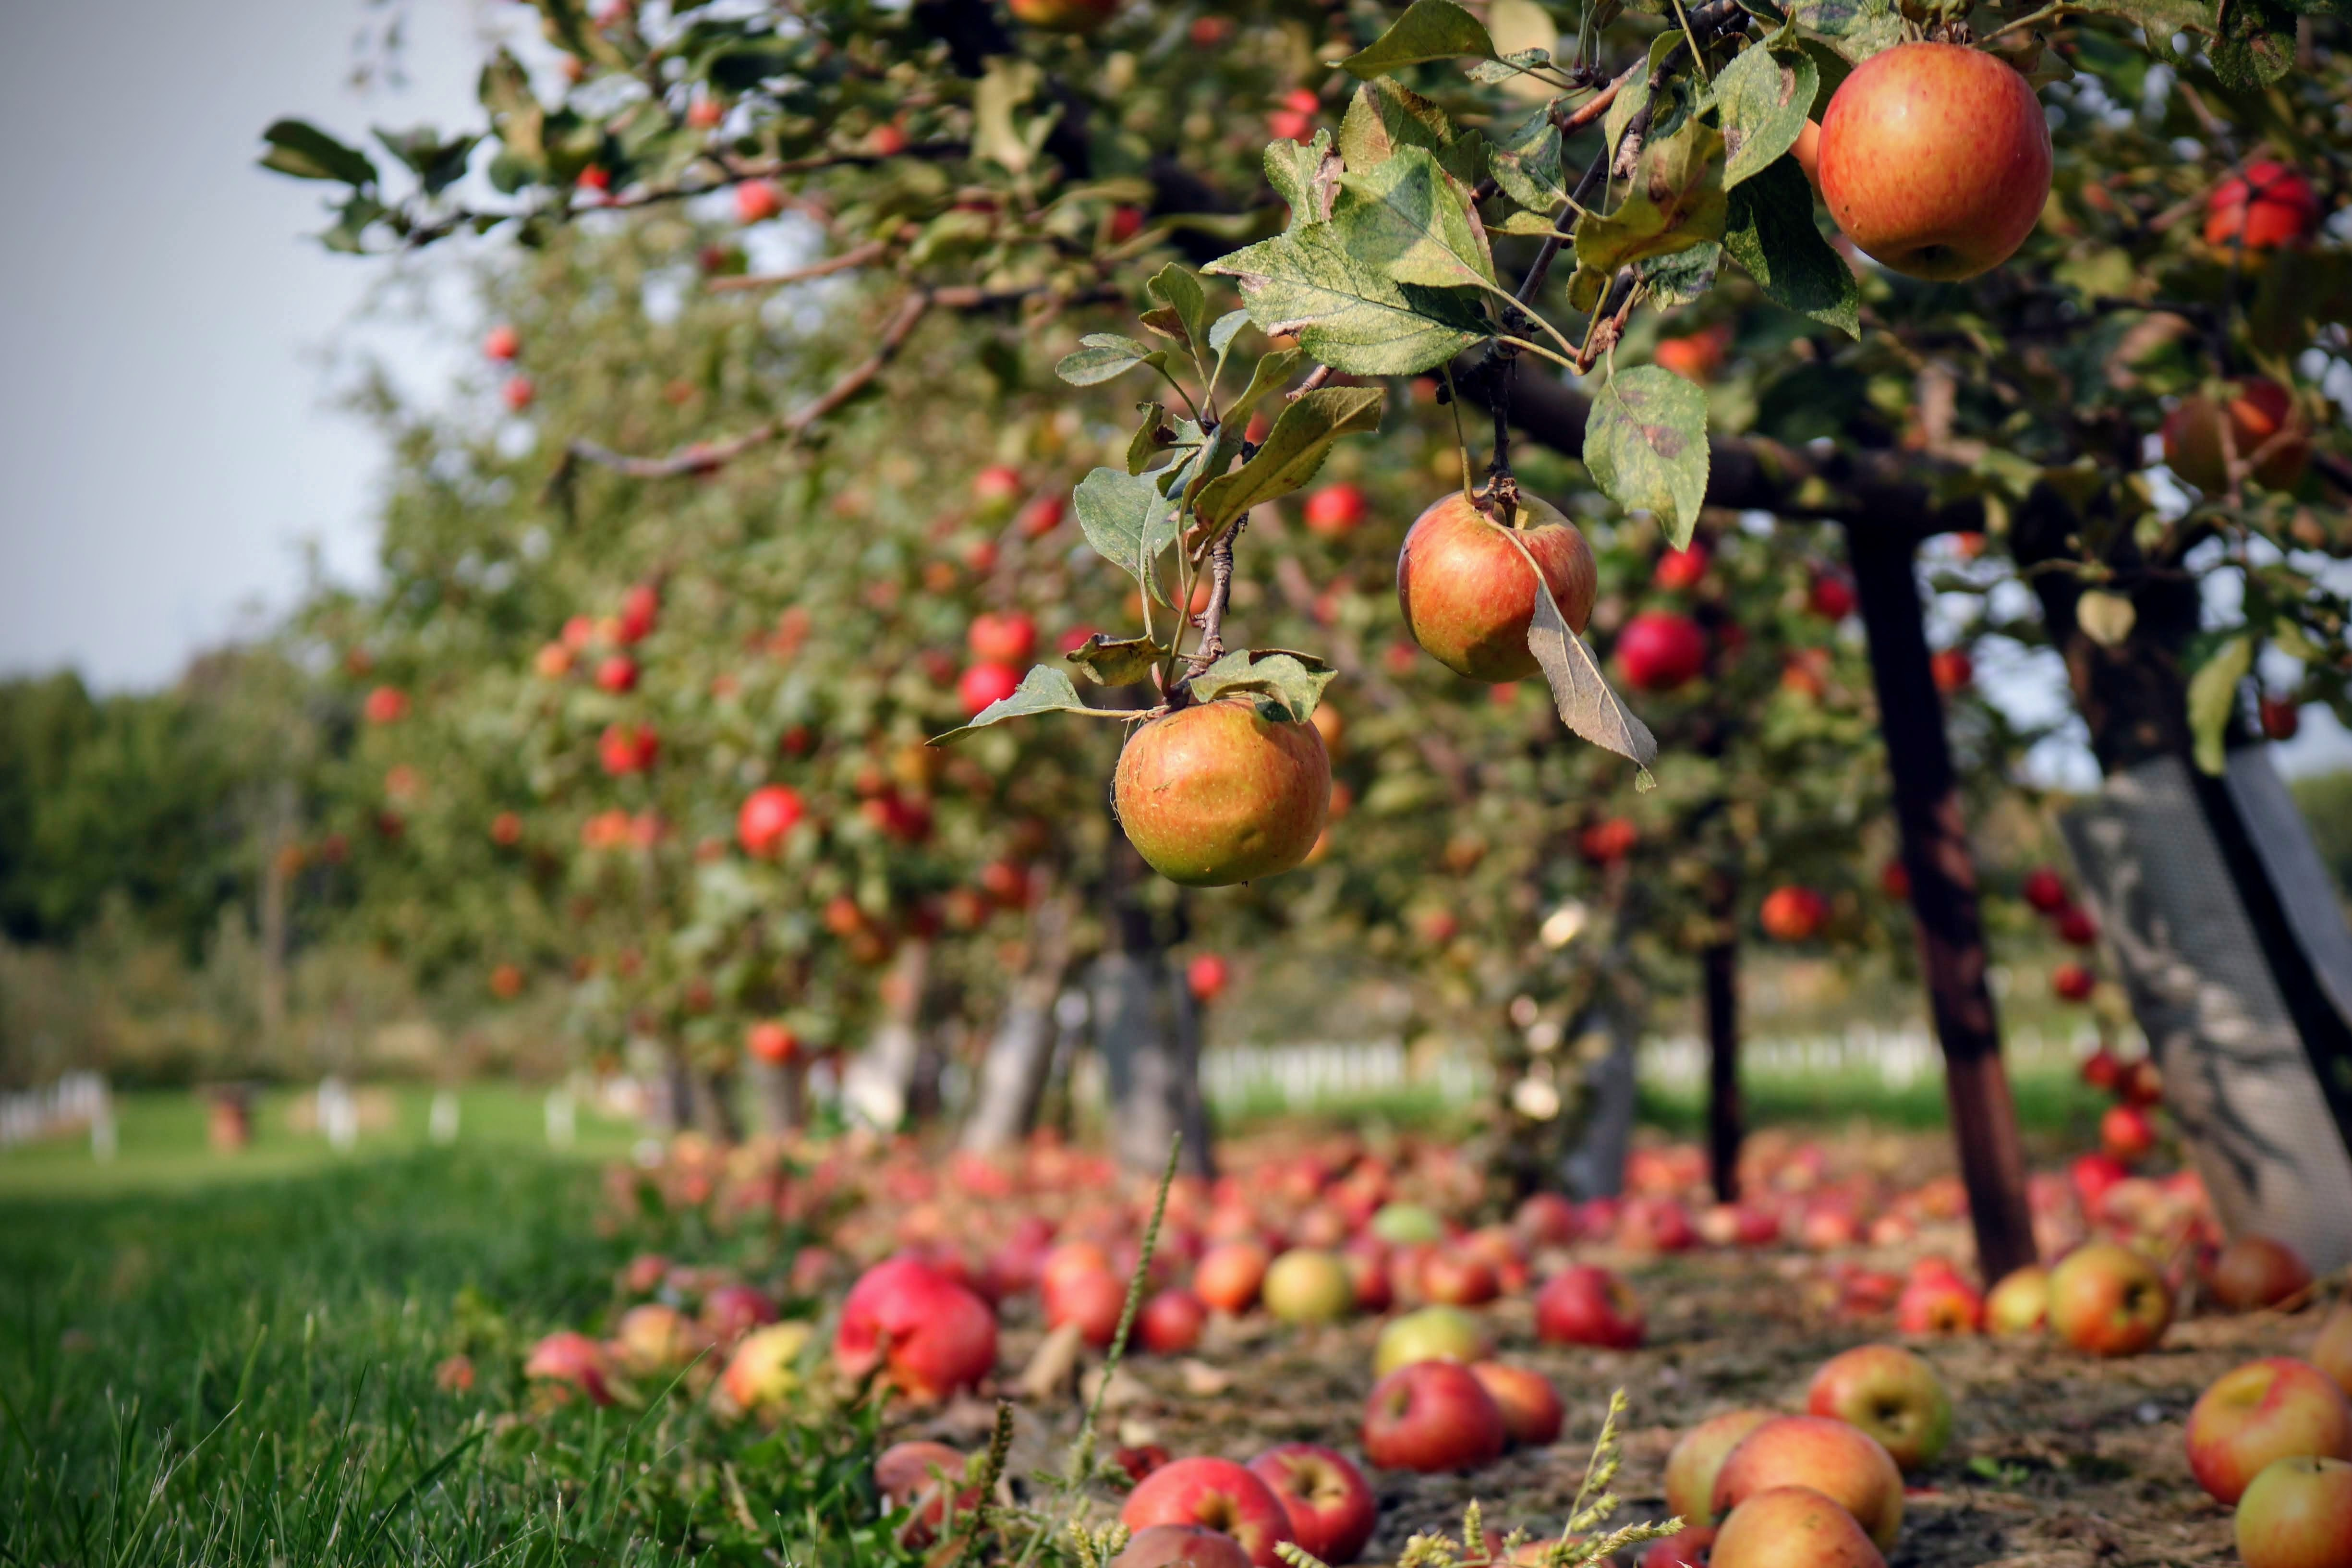 It's Apple Picking Season in Virginia